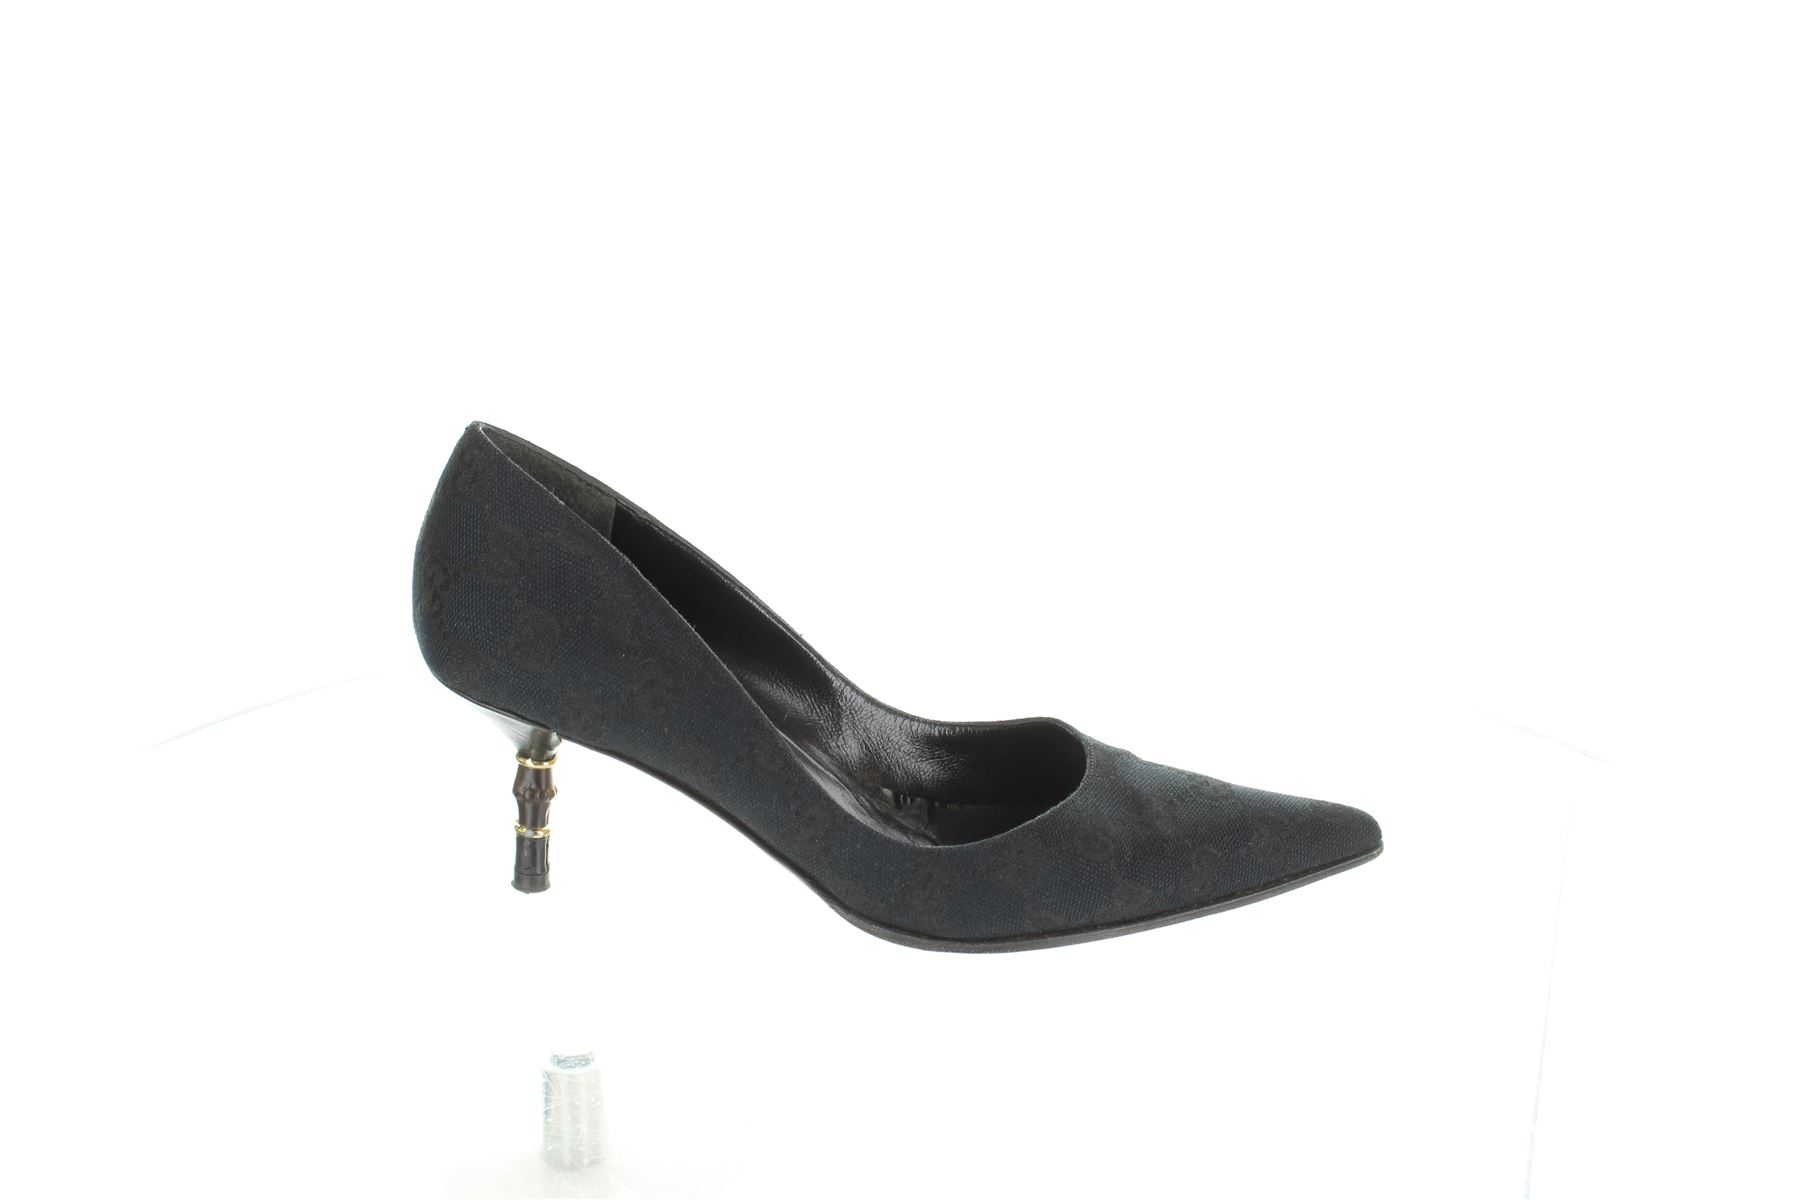 ee4487610f GUCCI Panno nero scarpe tacco basso, UK 2 US 5 EU 35 | eBay